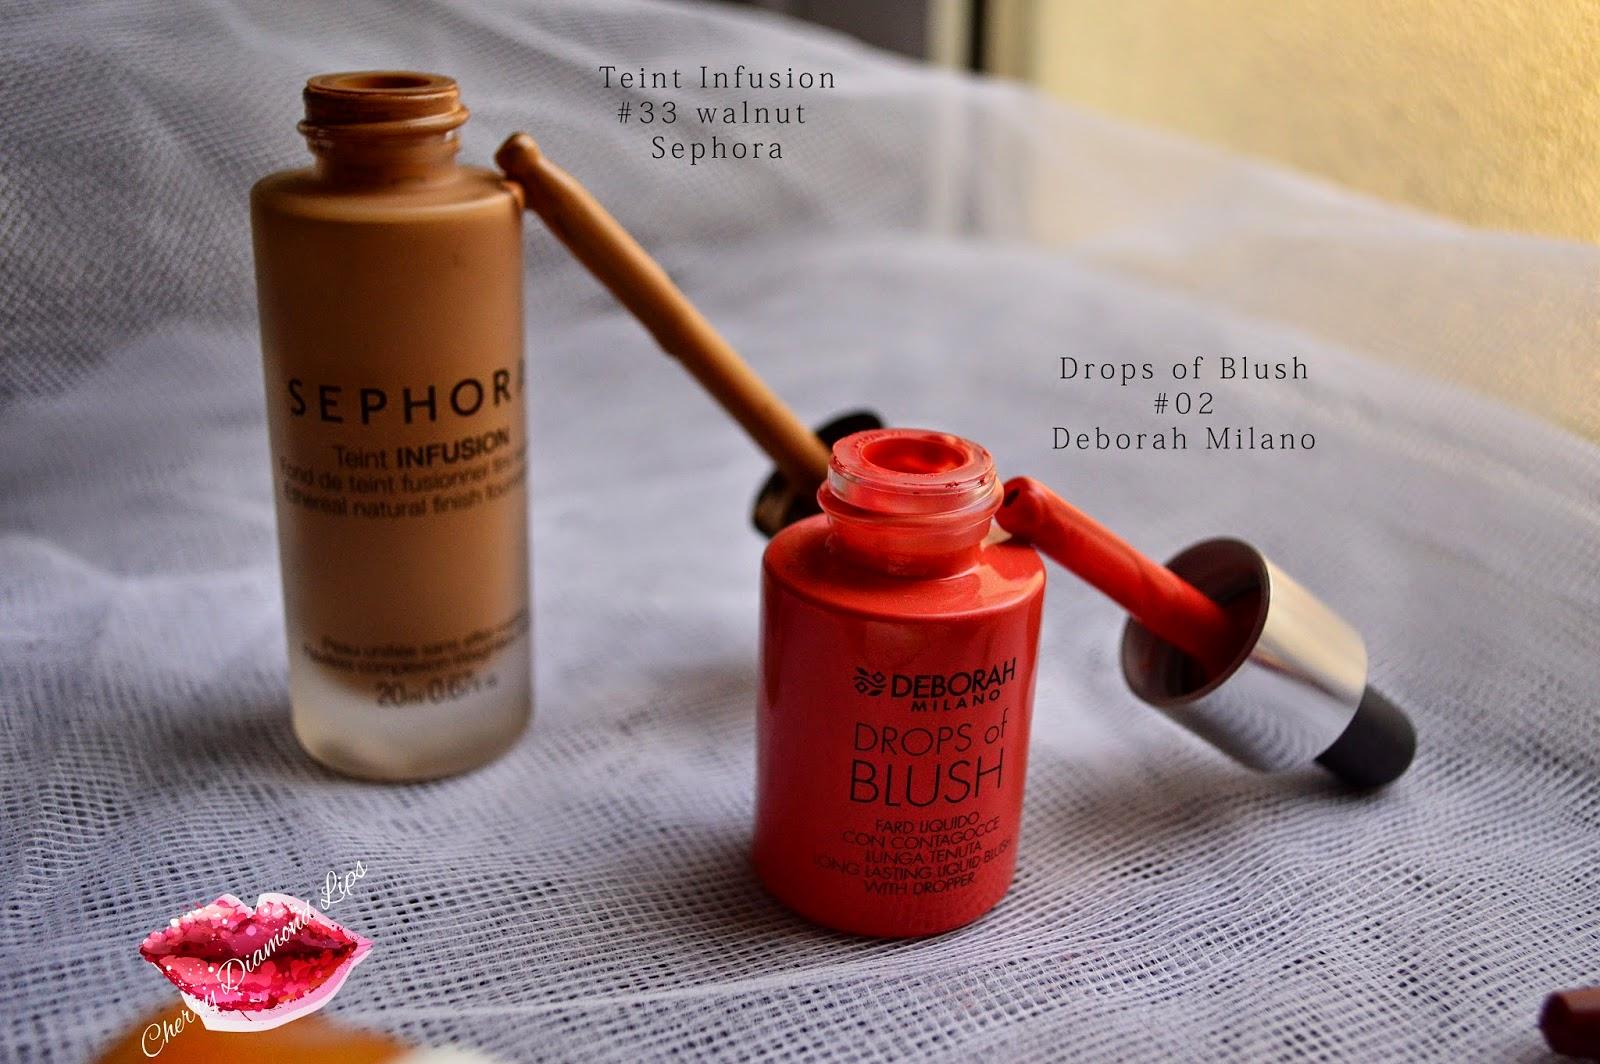 Teint Infusion Sephora, Drops of Blush Deborah Milano